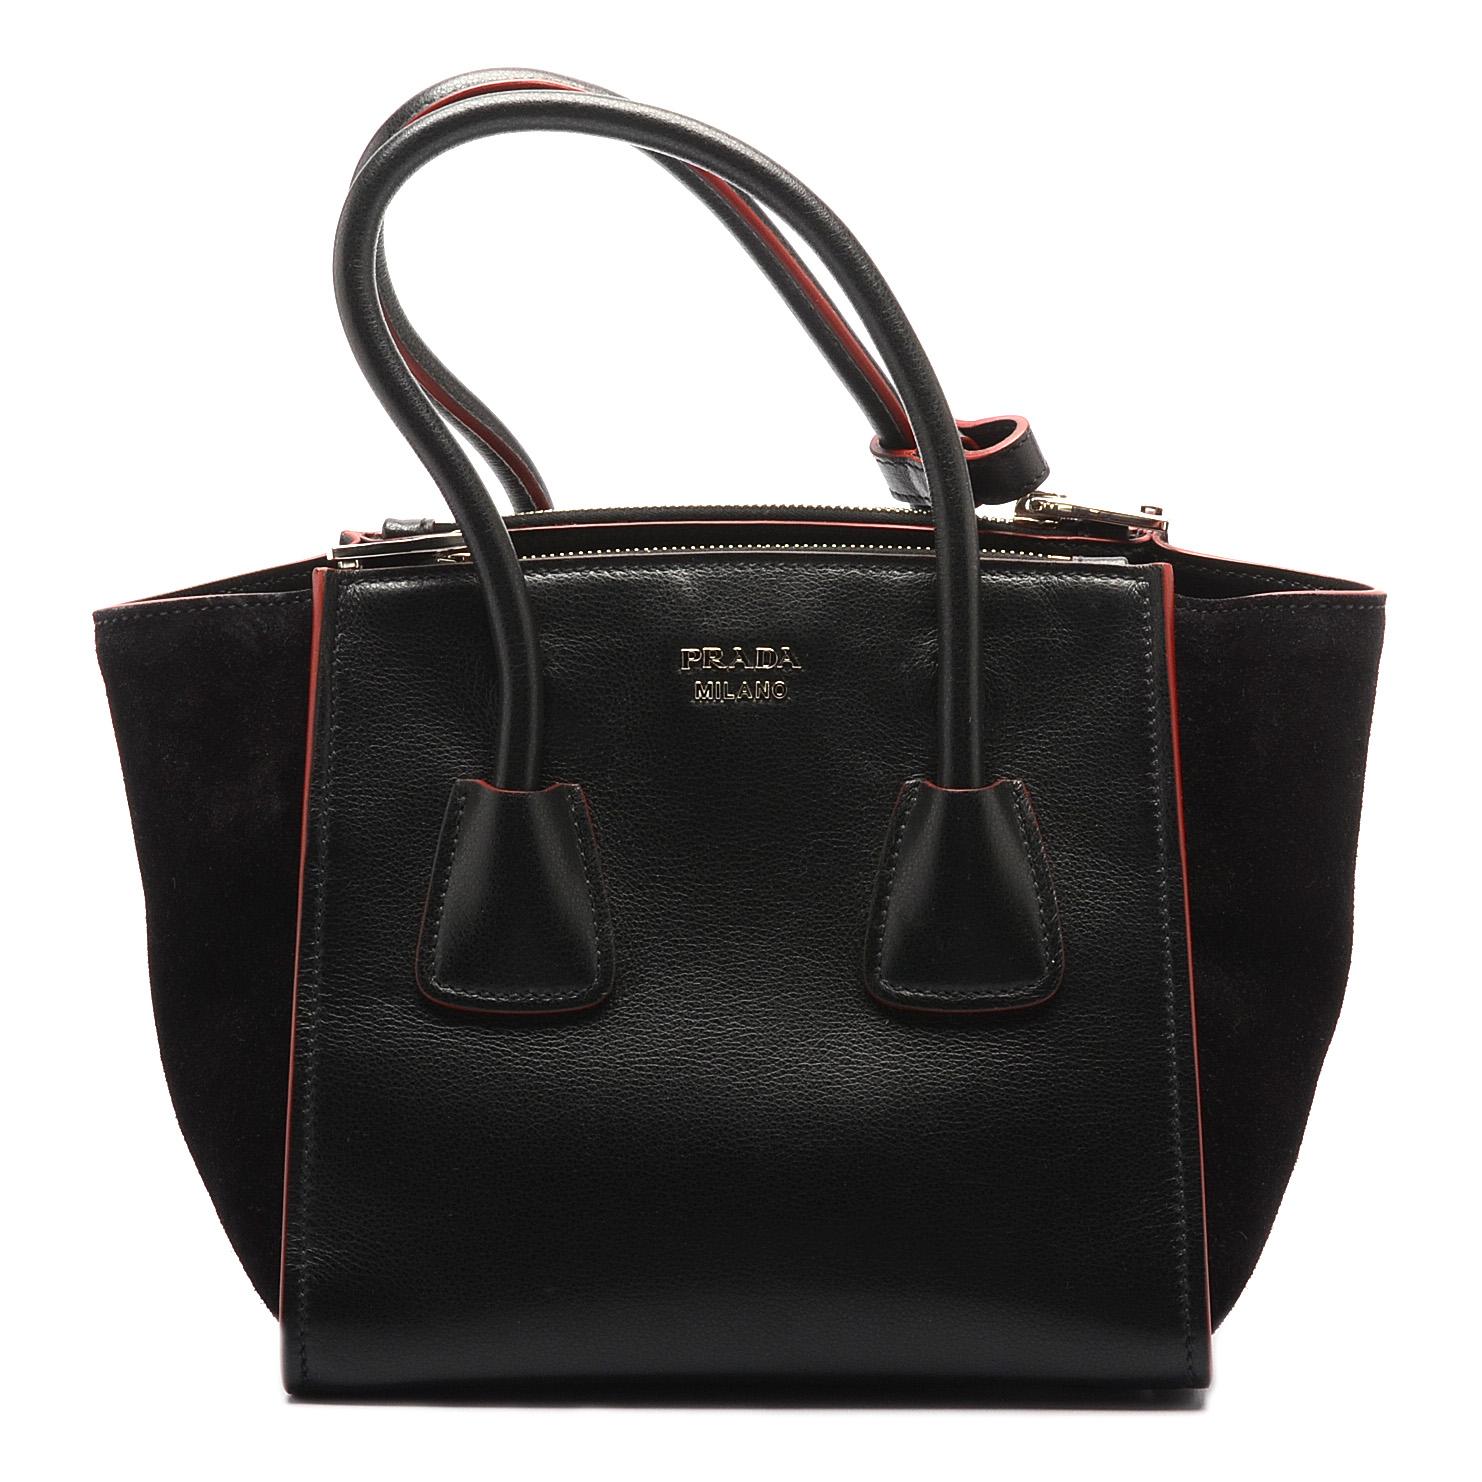 4c56f22028d1bd ... where to buy prada glace twin pocket leather handbag d8e87 12168